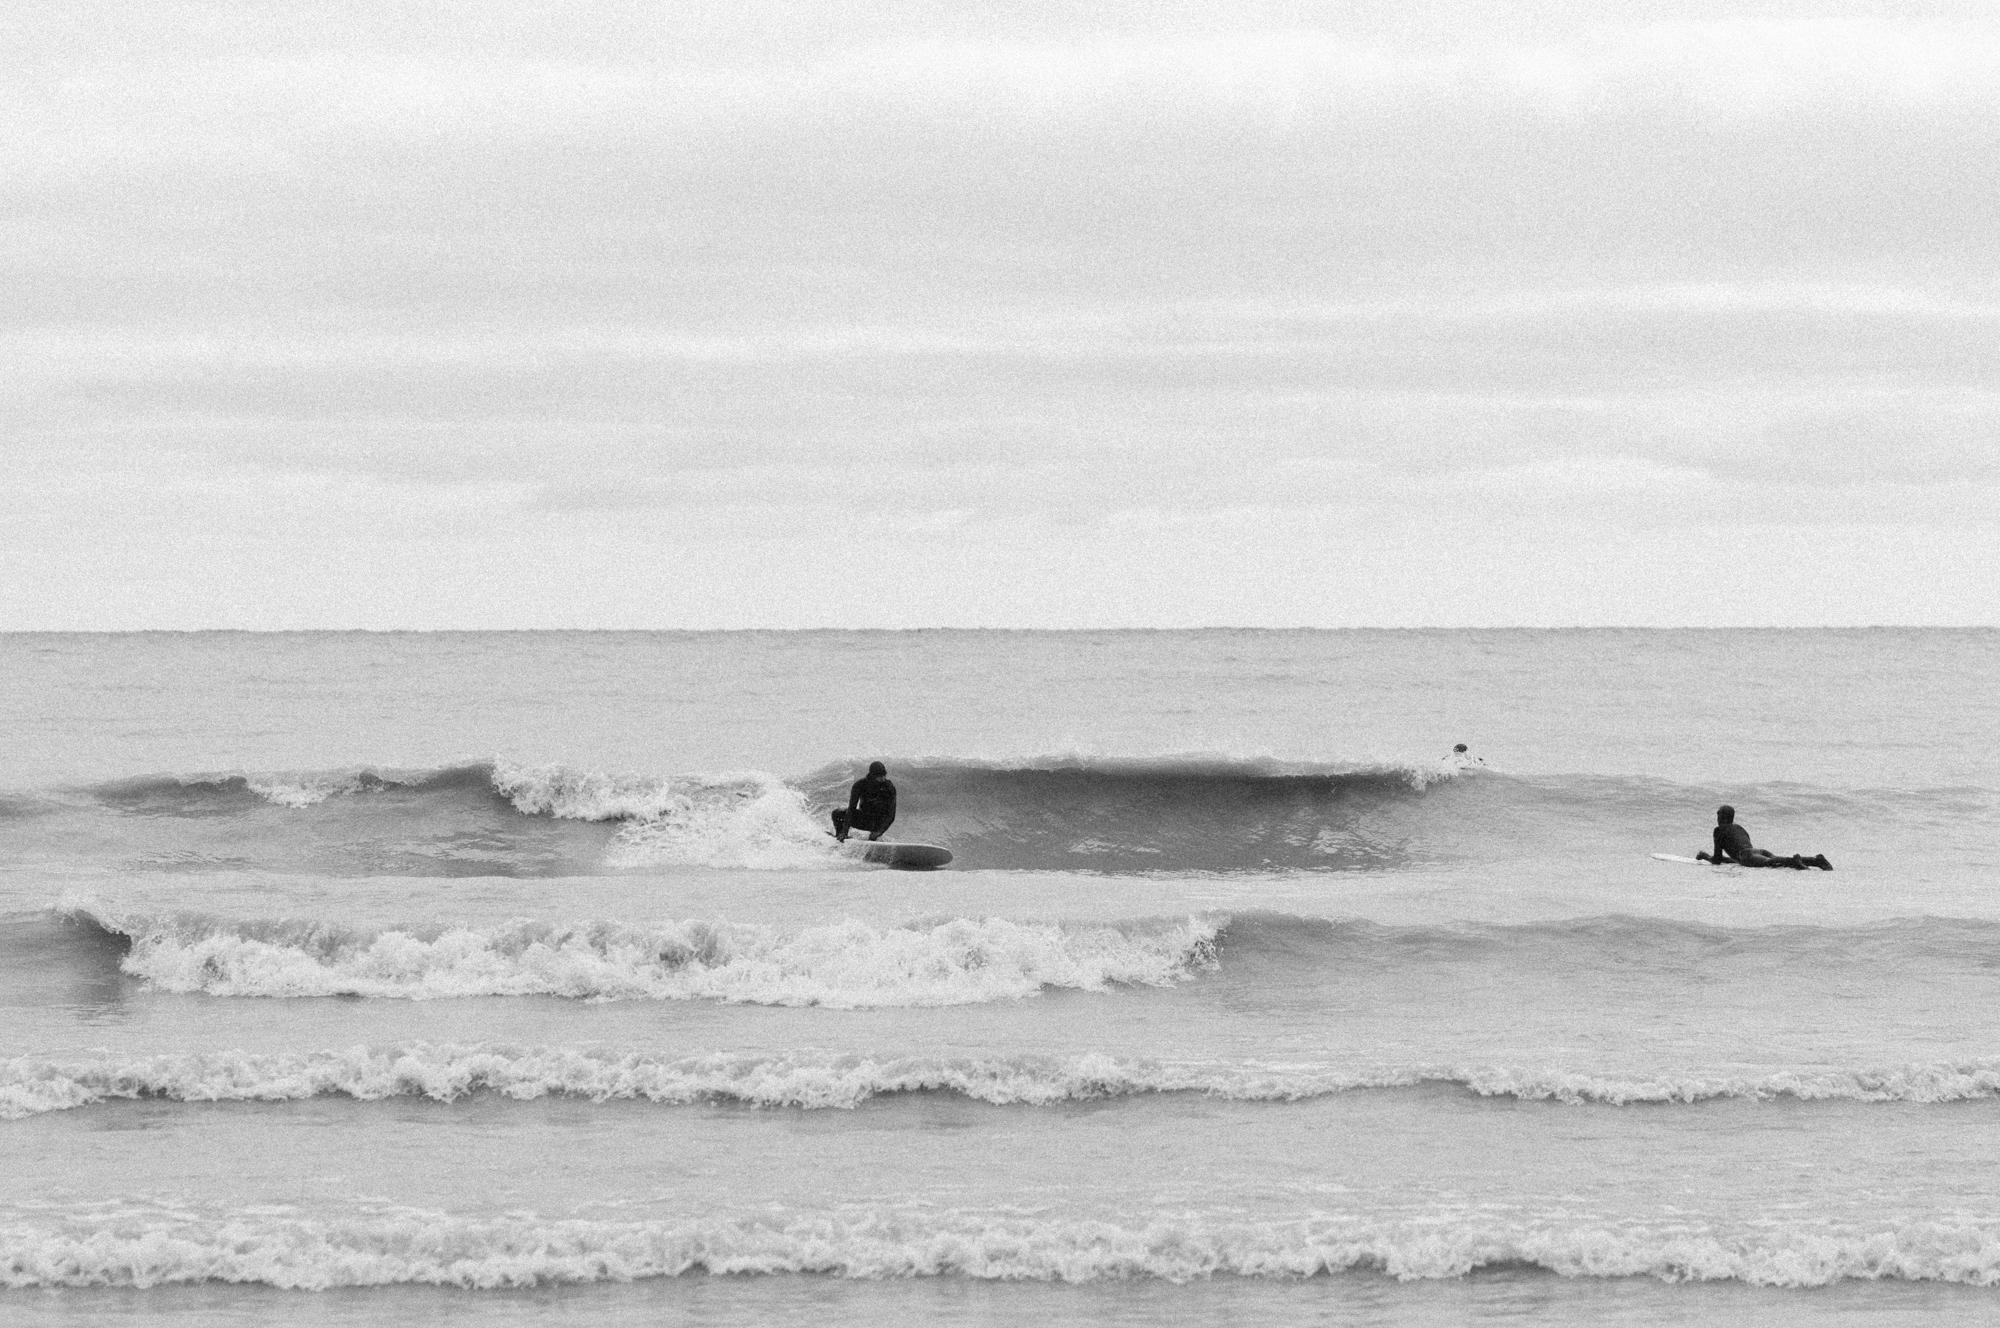 20141113_Surf_0112.jpg